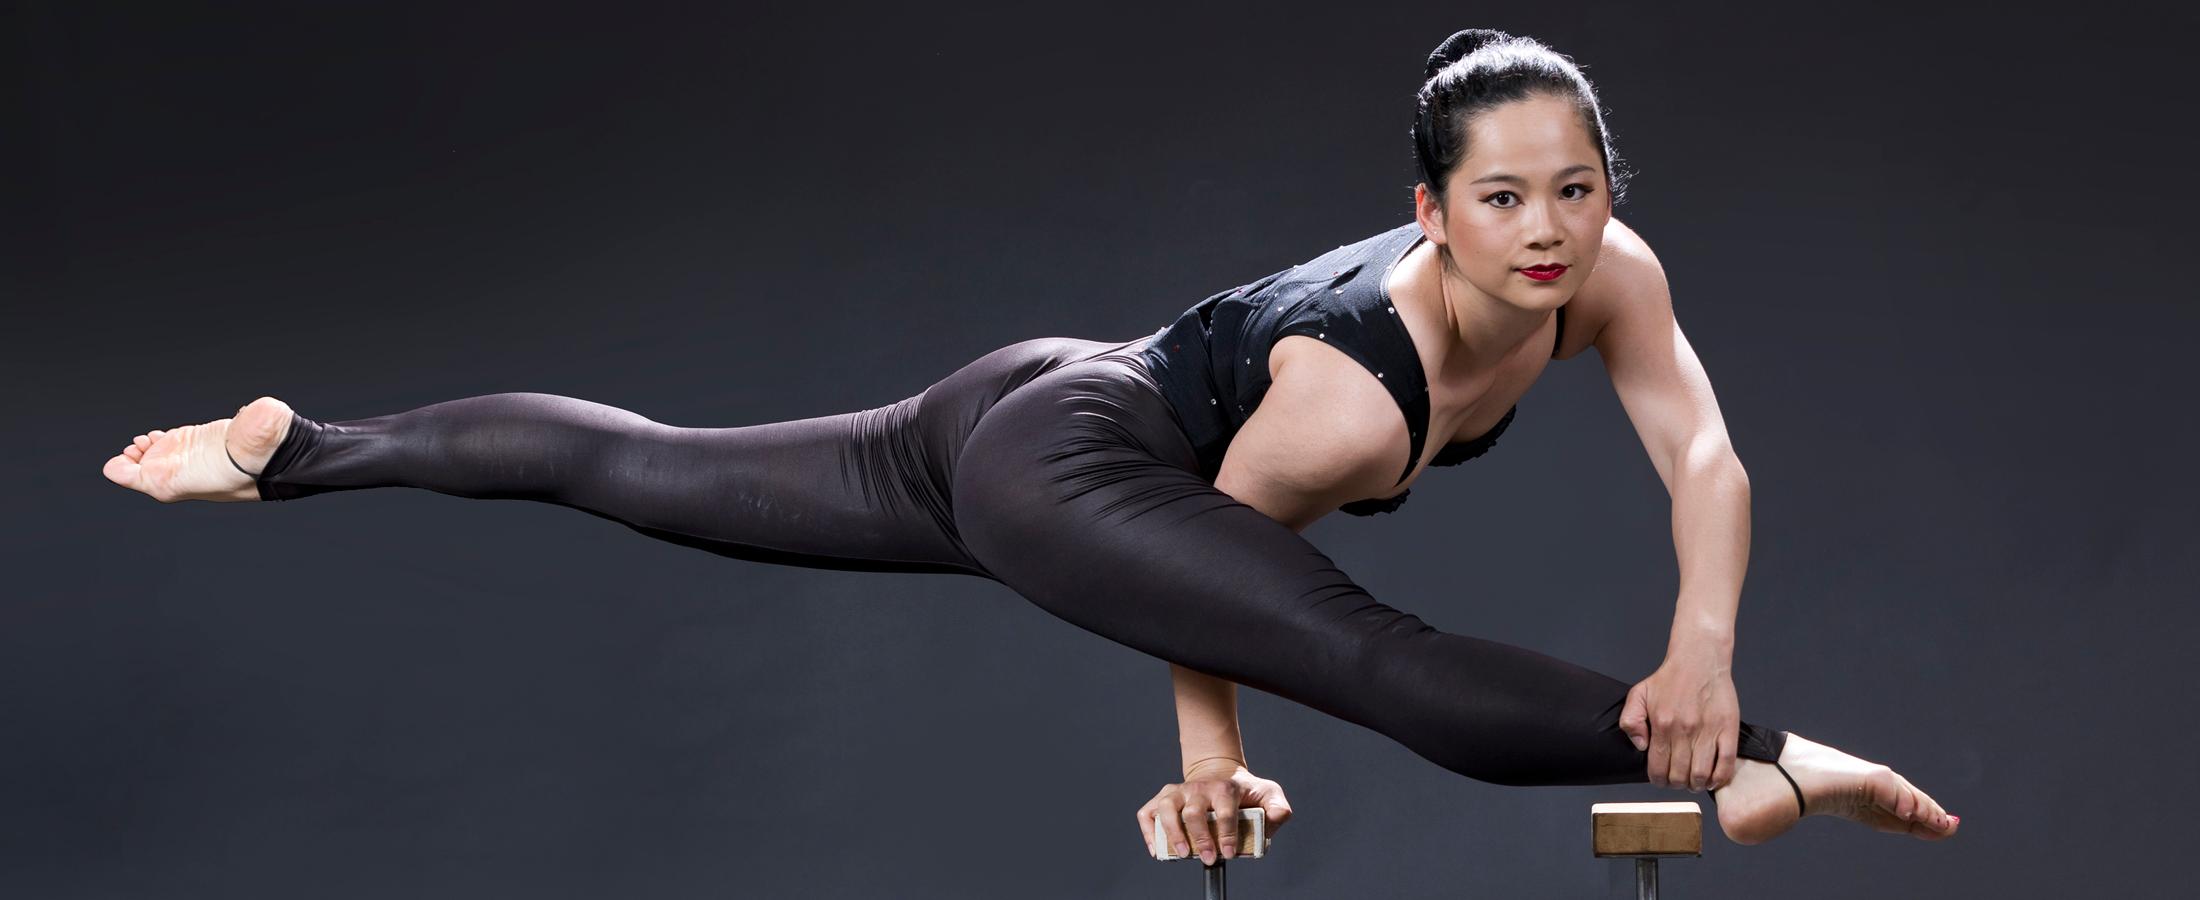 Junlin Zhang-Mack